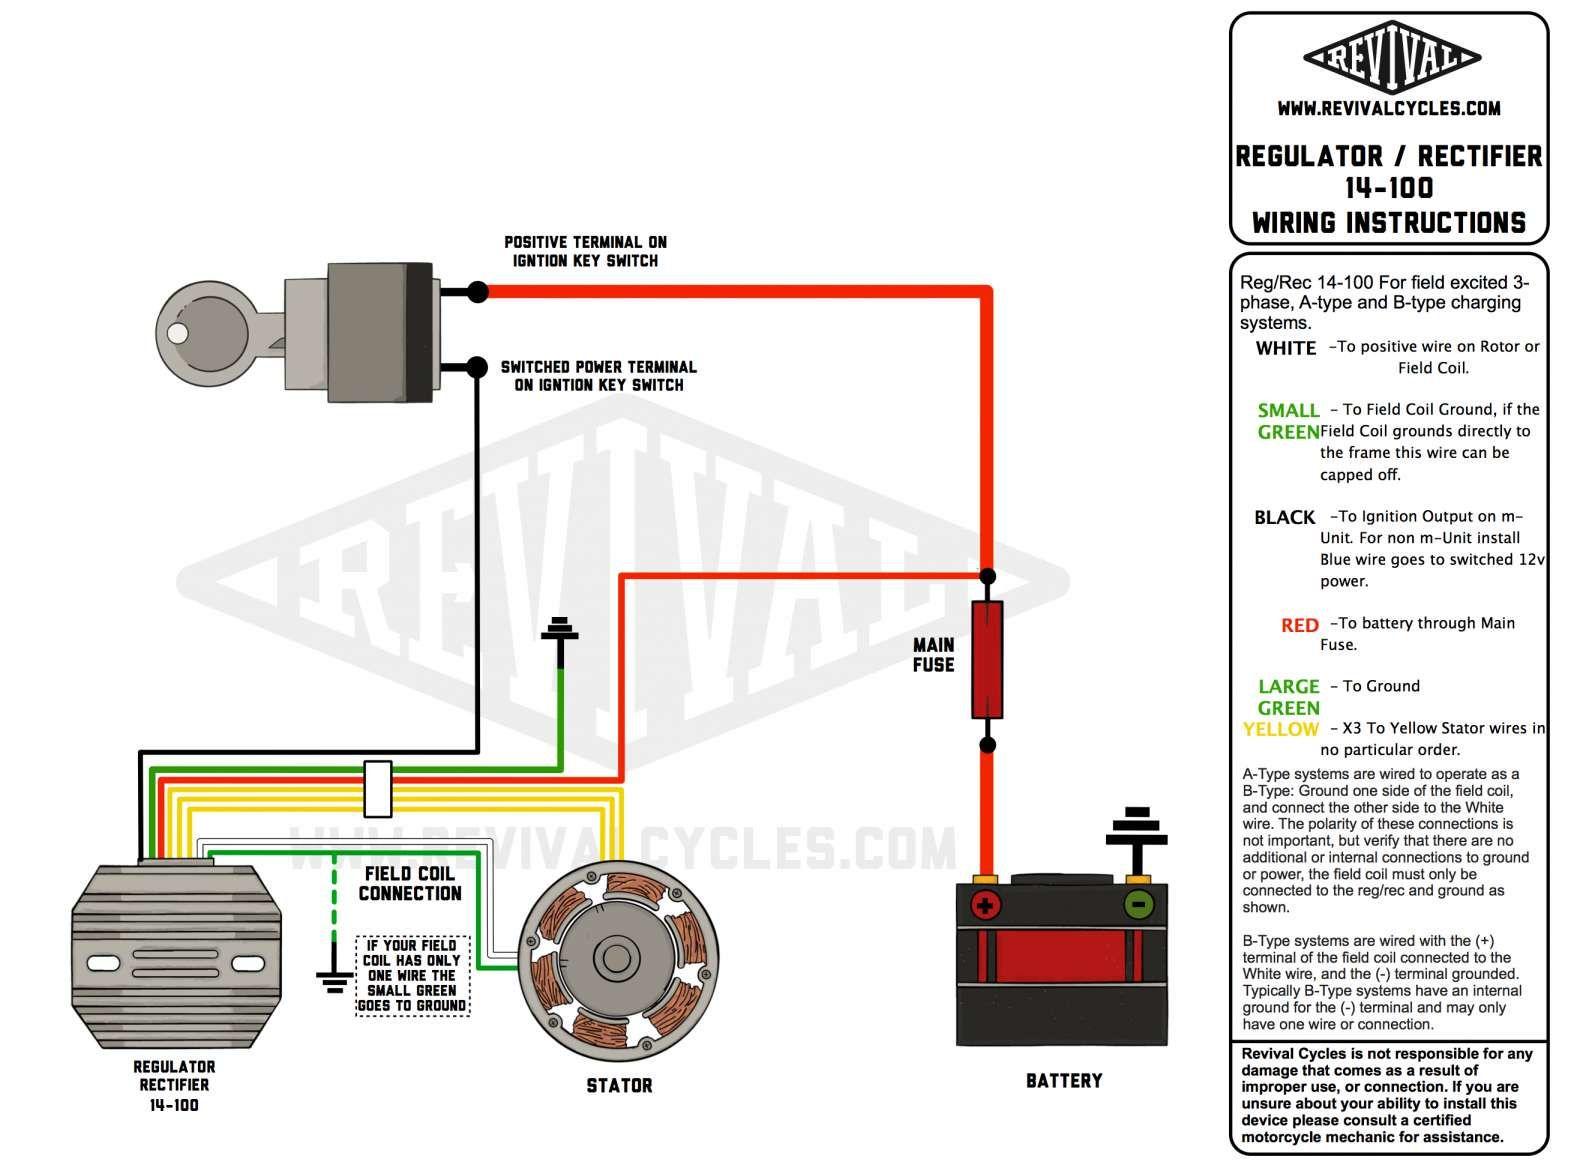 15+ Motorcycle Rectifier Wiring Diagram - Motorcycle Diagram in 2020   Voltage  regulator, Circuit diagram, Motorcycle wiringPinterest